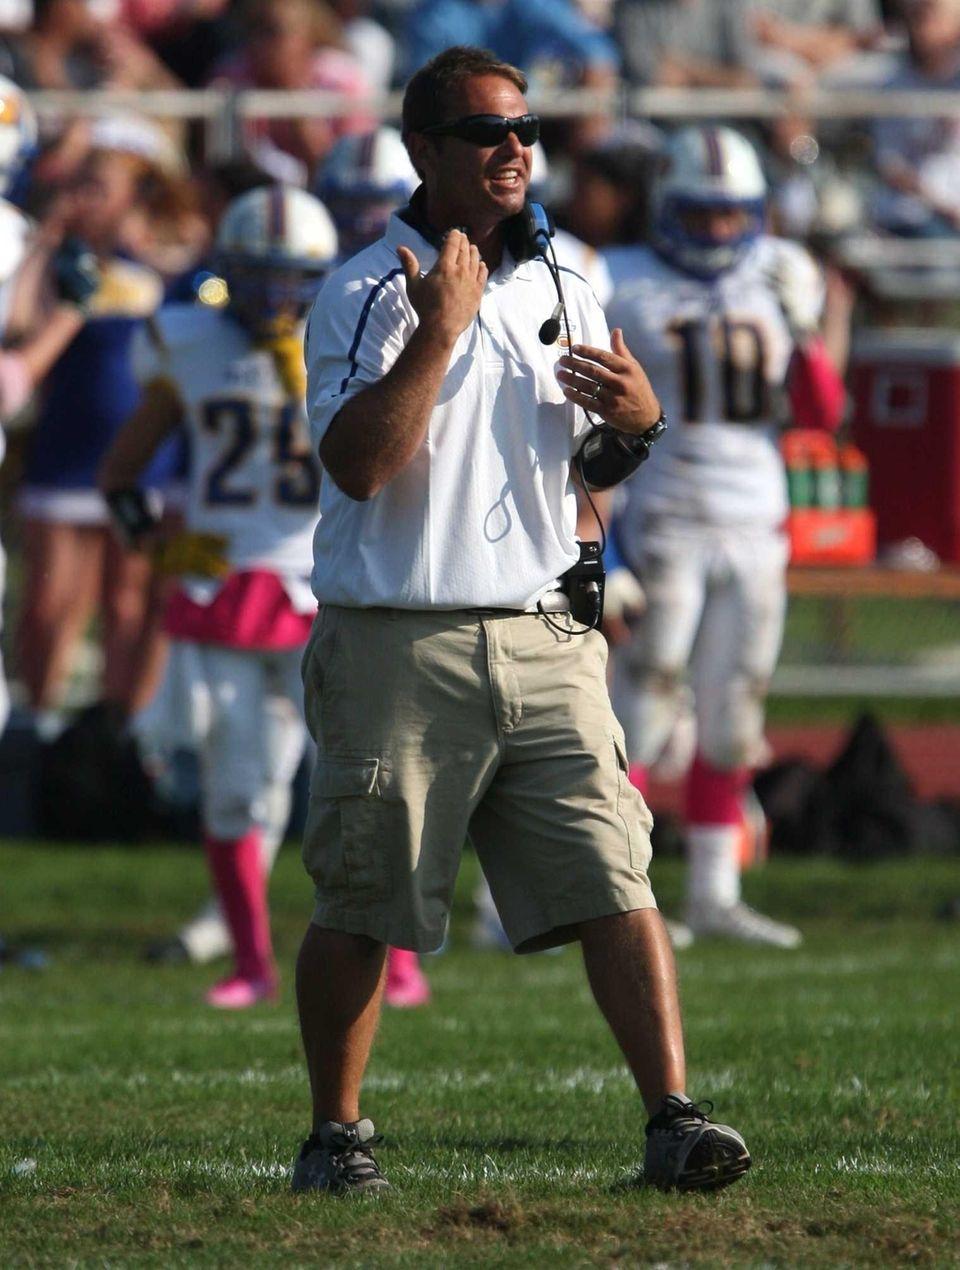 West Islip head coach Steve Meliti is seen